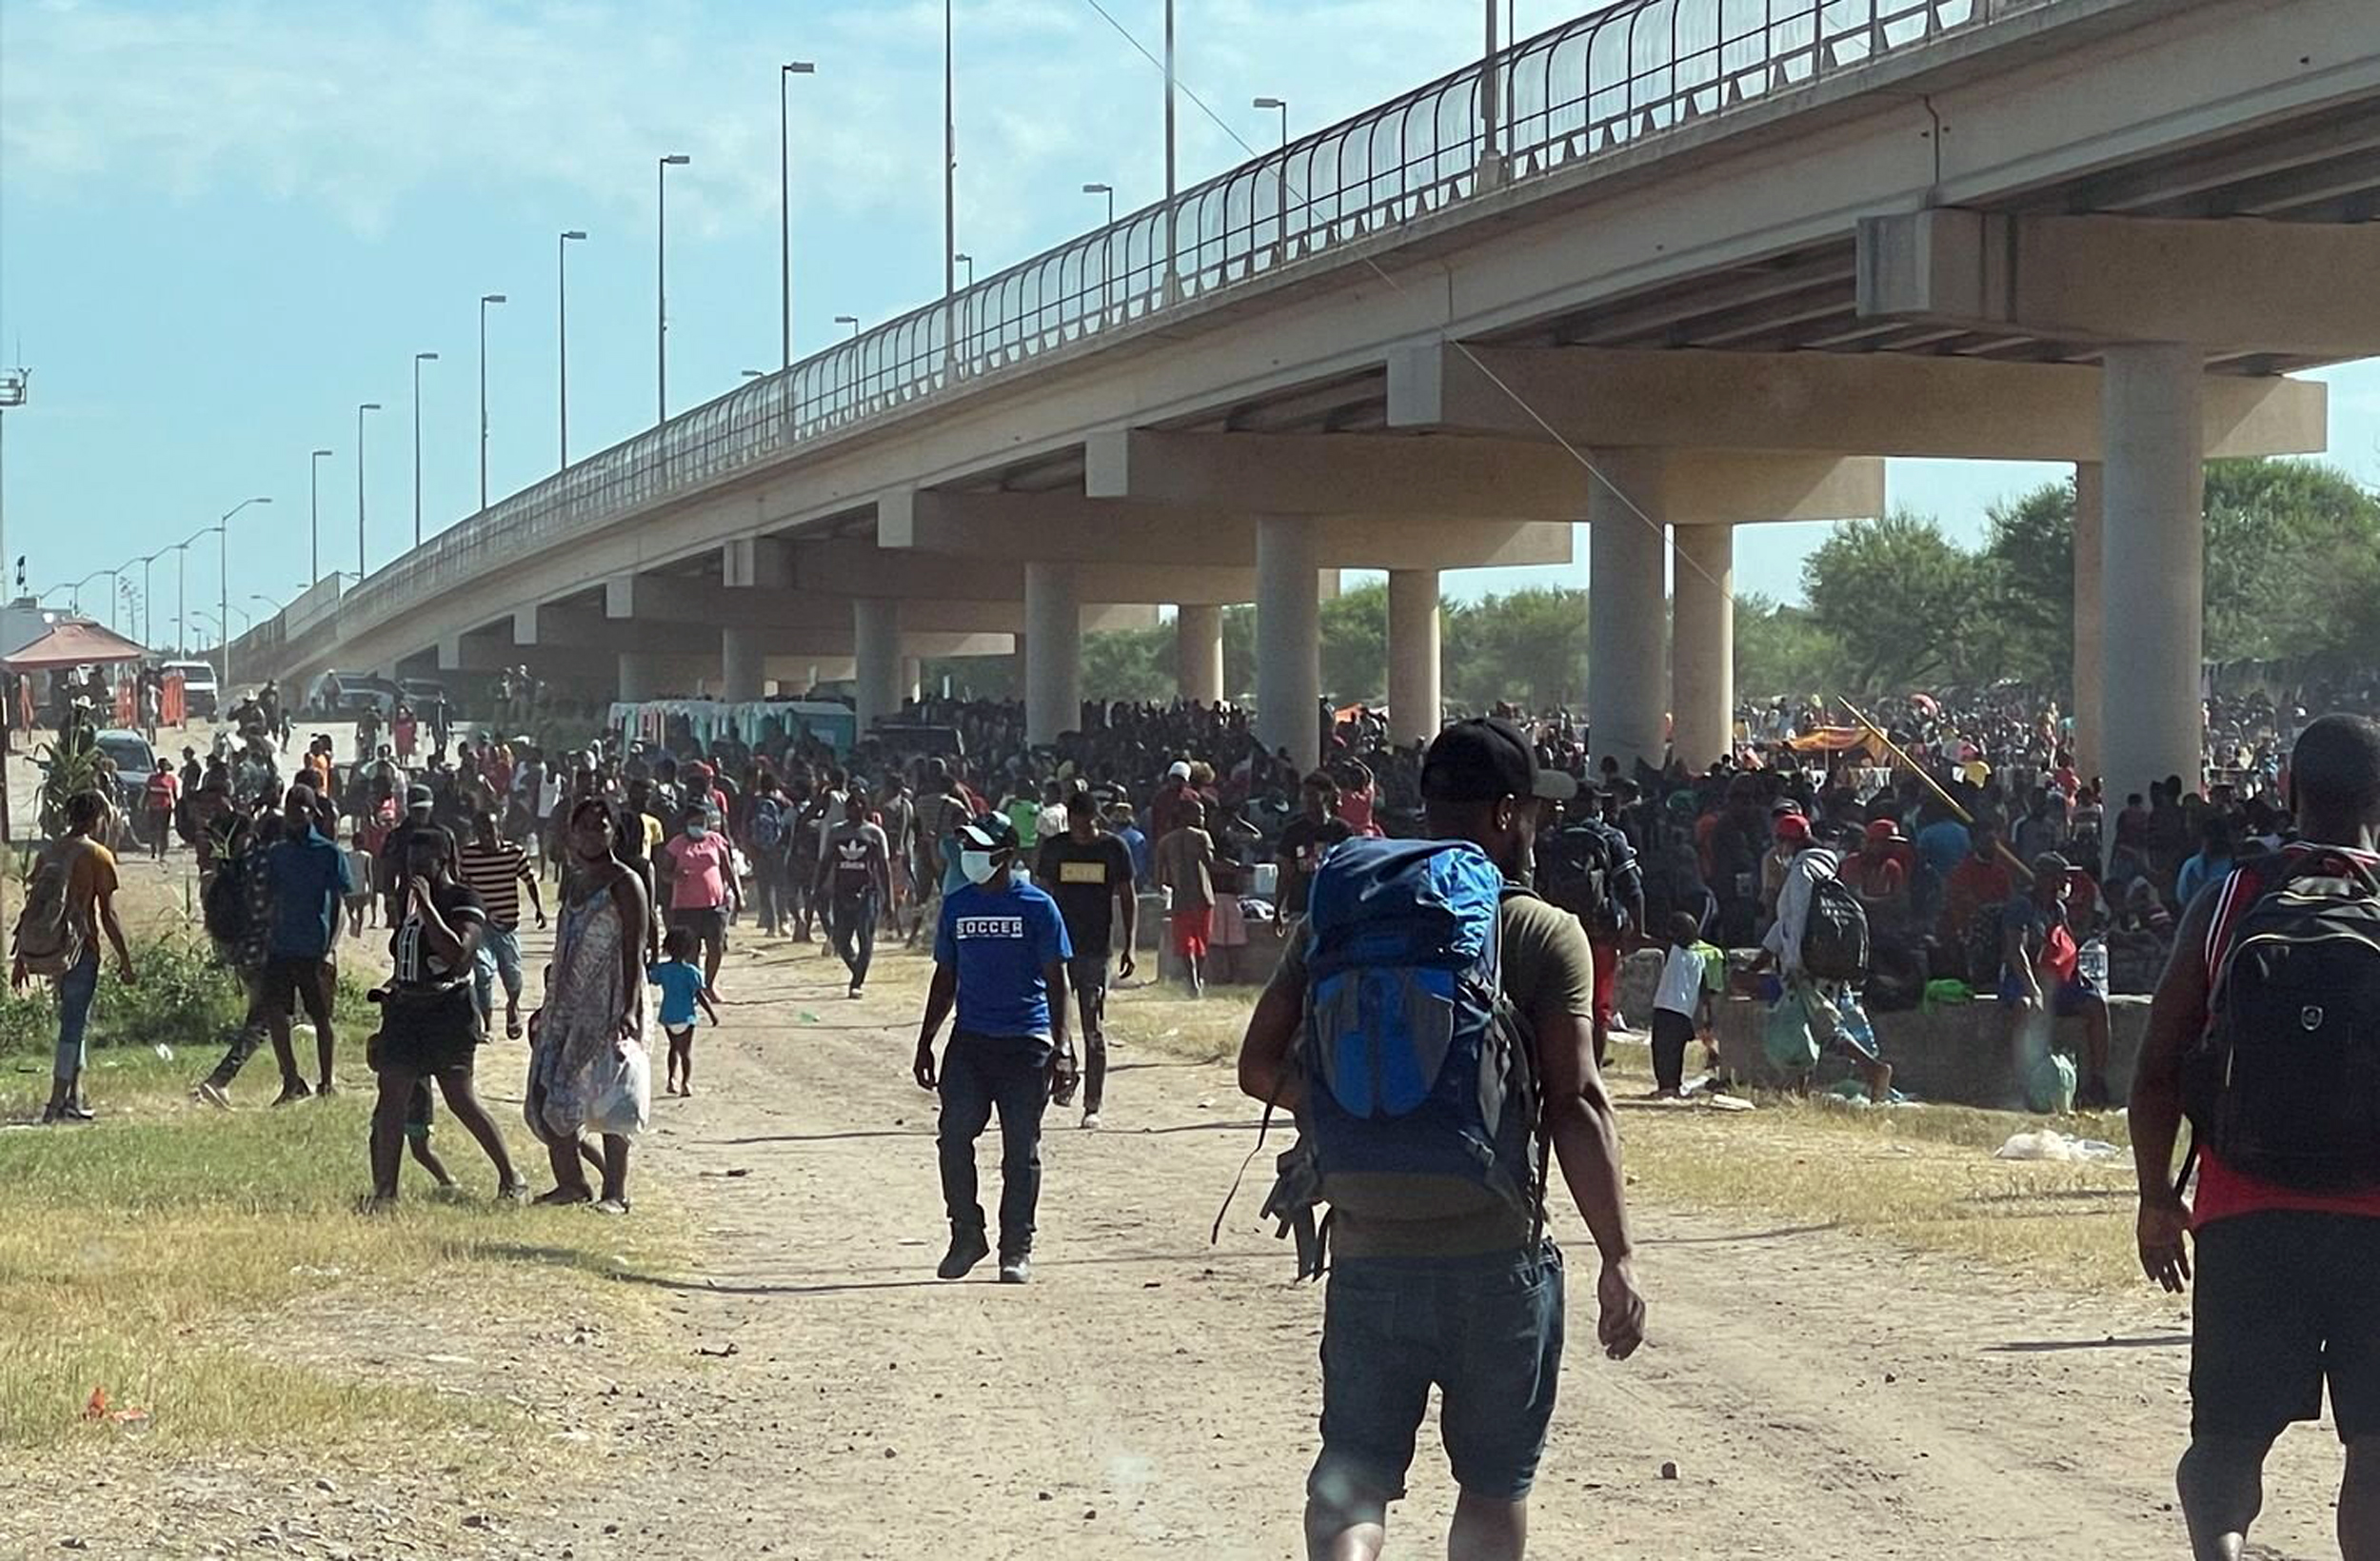 Biden admin ramps up deportation of Haitians as 10,000 migrants shelter under Texas bridge